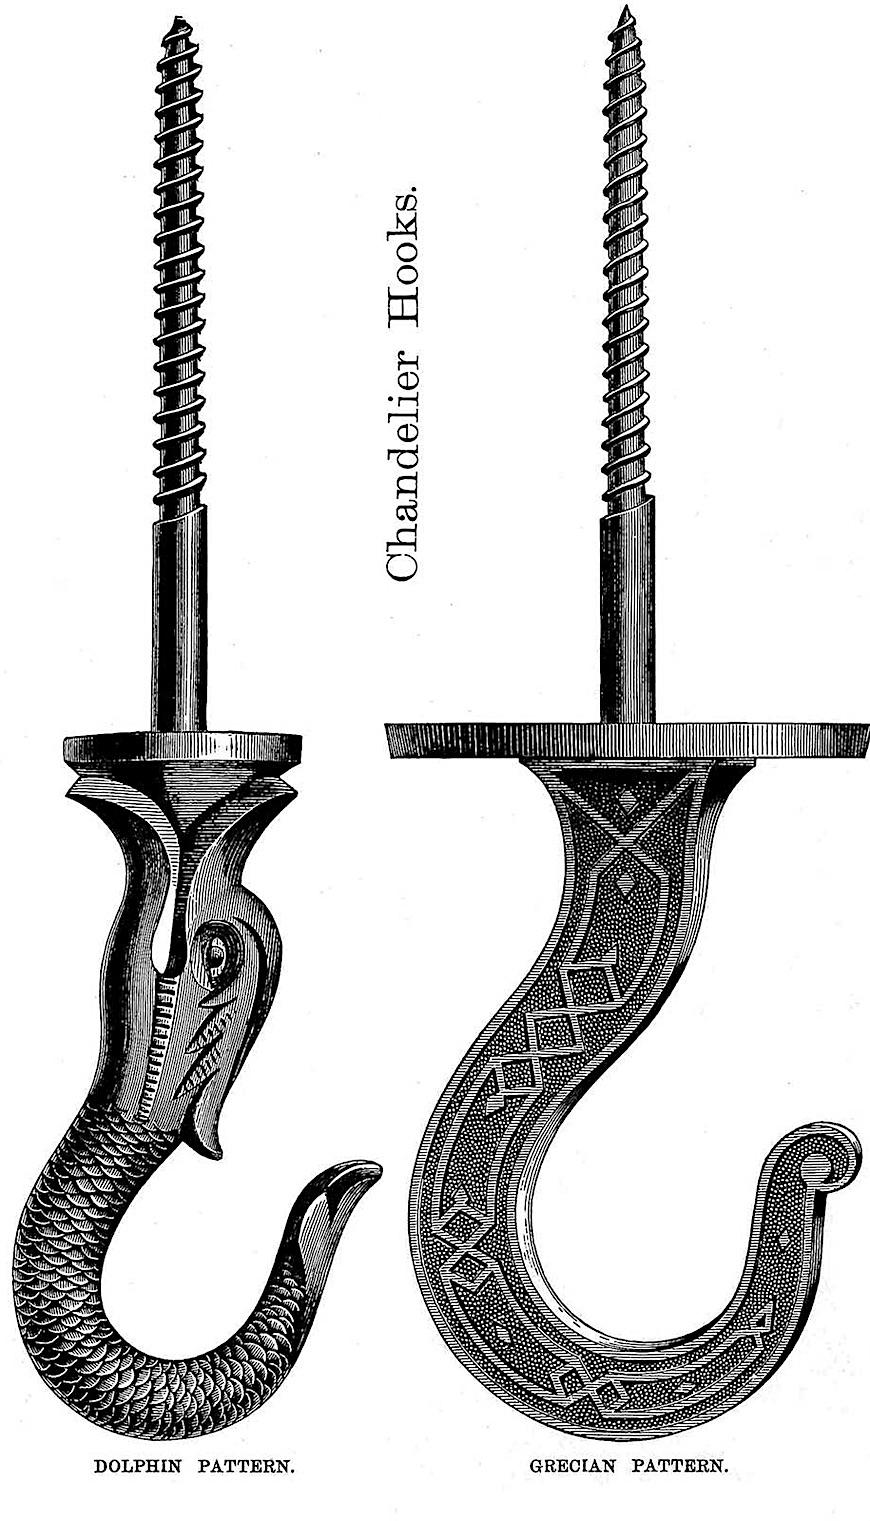 1874 chandelier hooks, an ornamented illustration